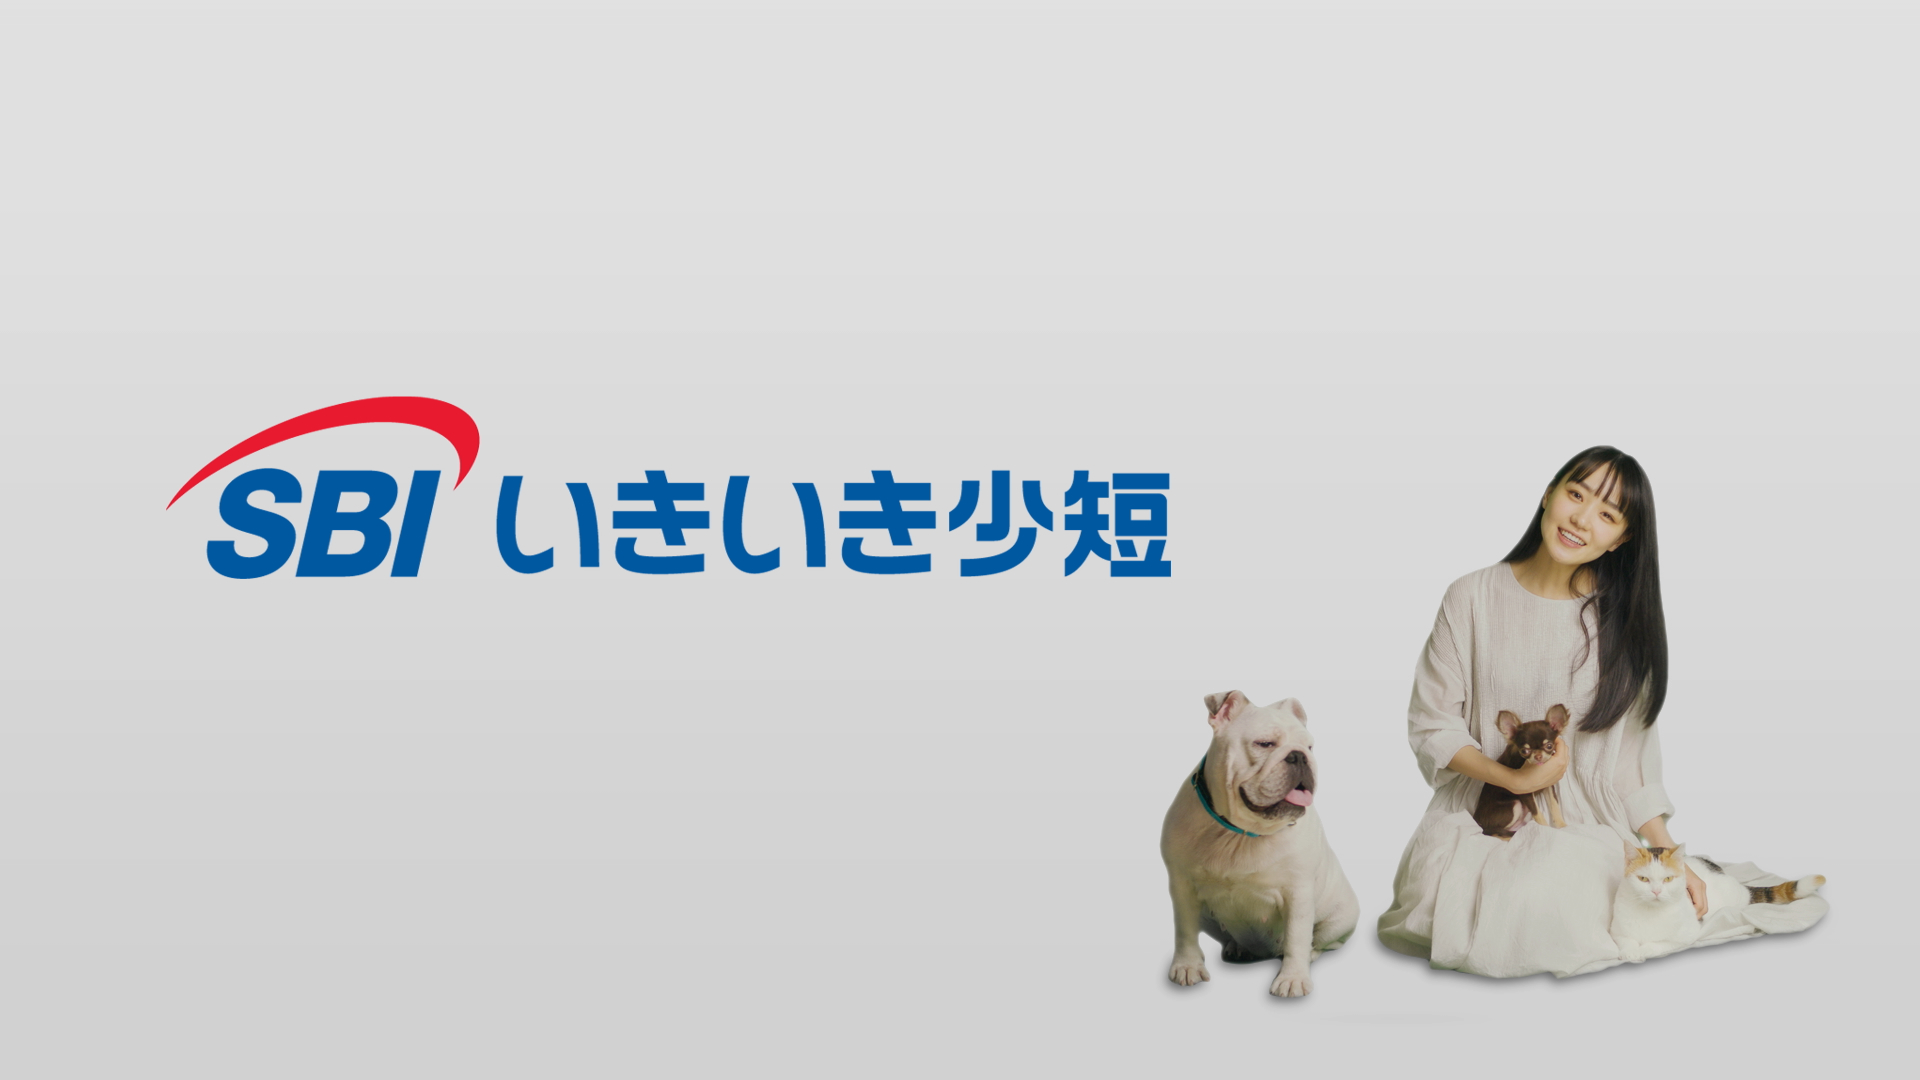 sbi ペット 保険 cm